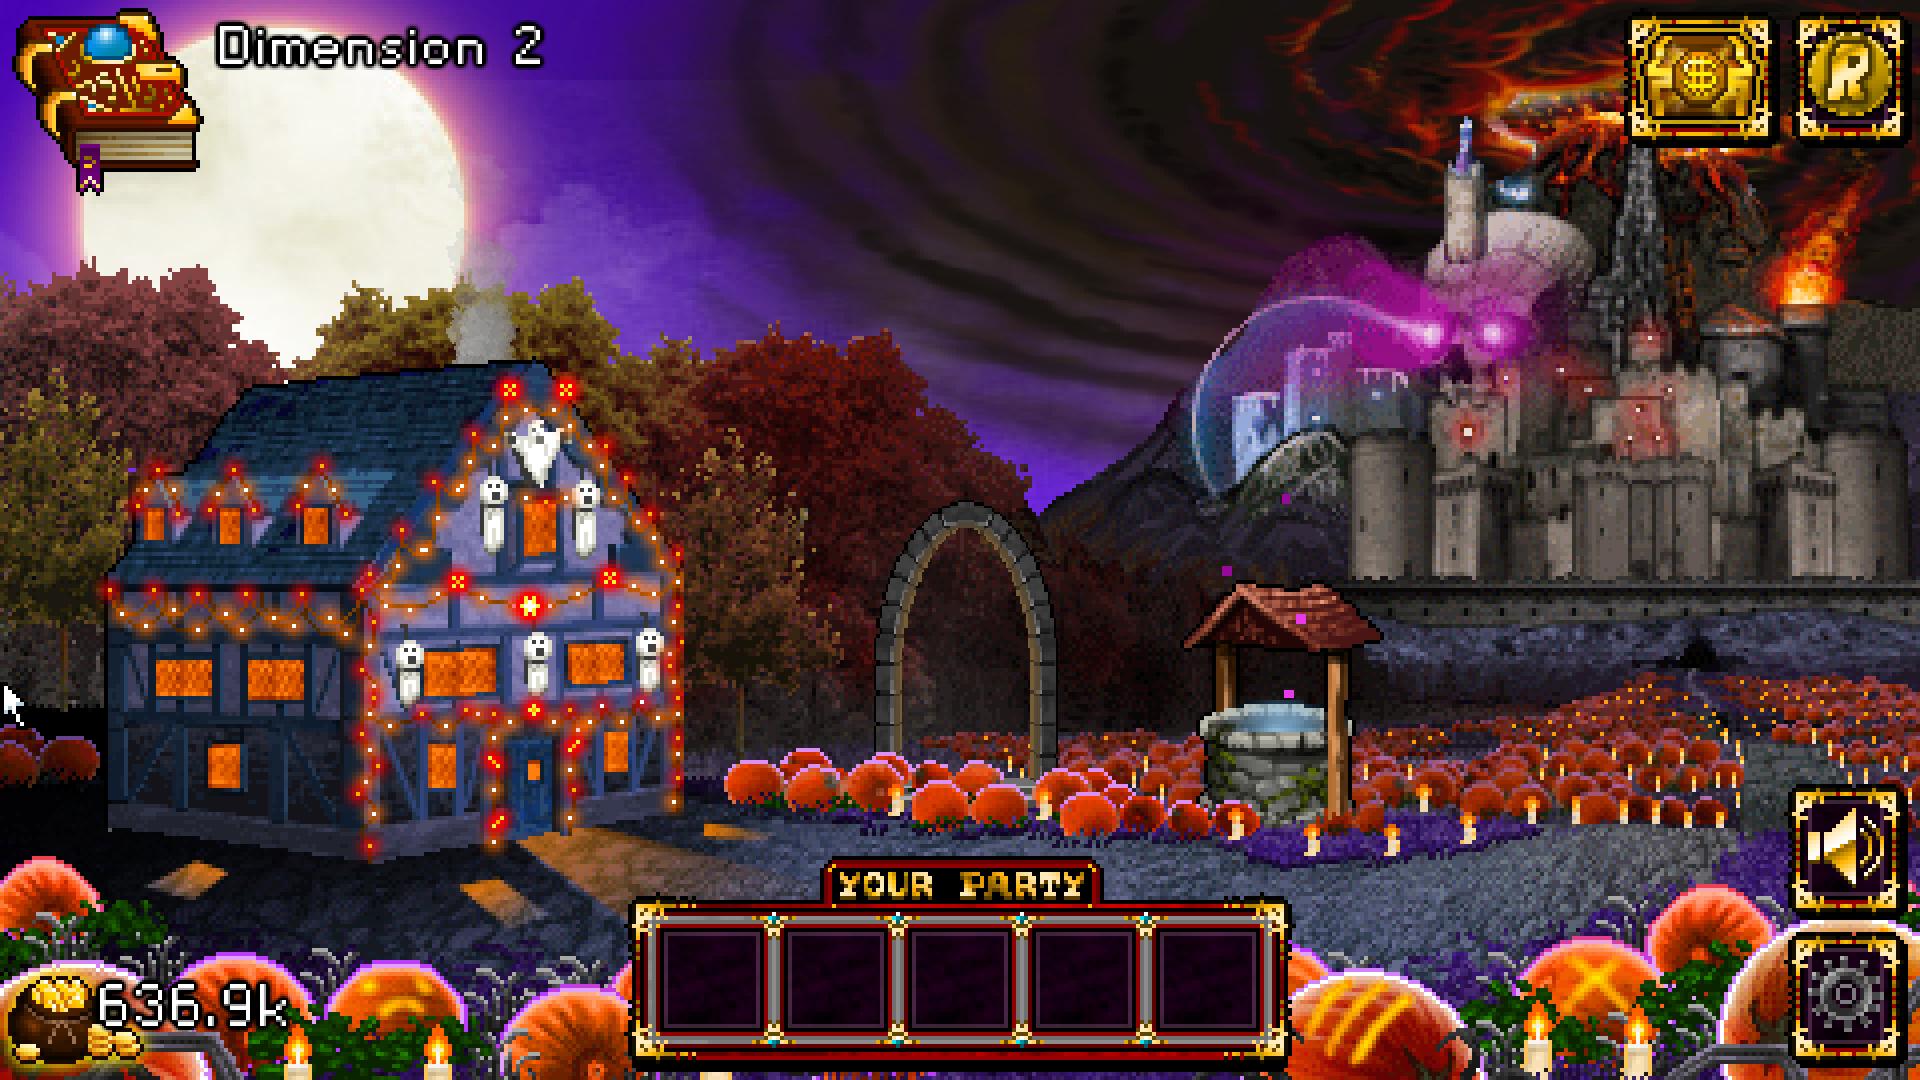 soda dungeon :: version 1.2.41 halloween update is now live!